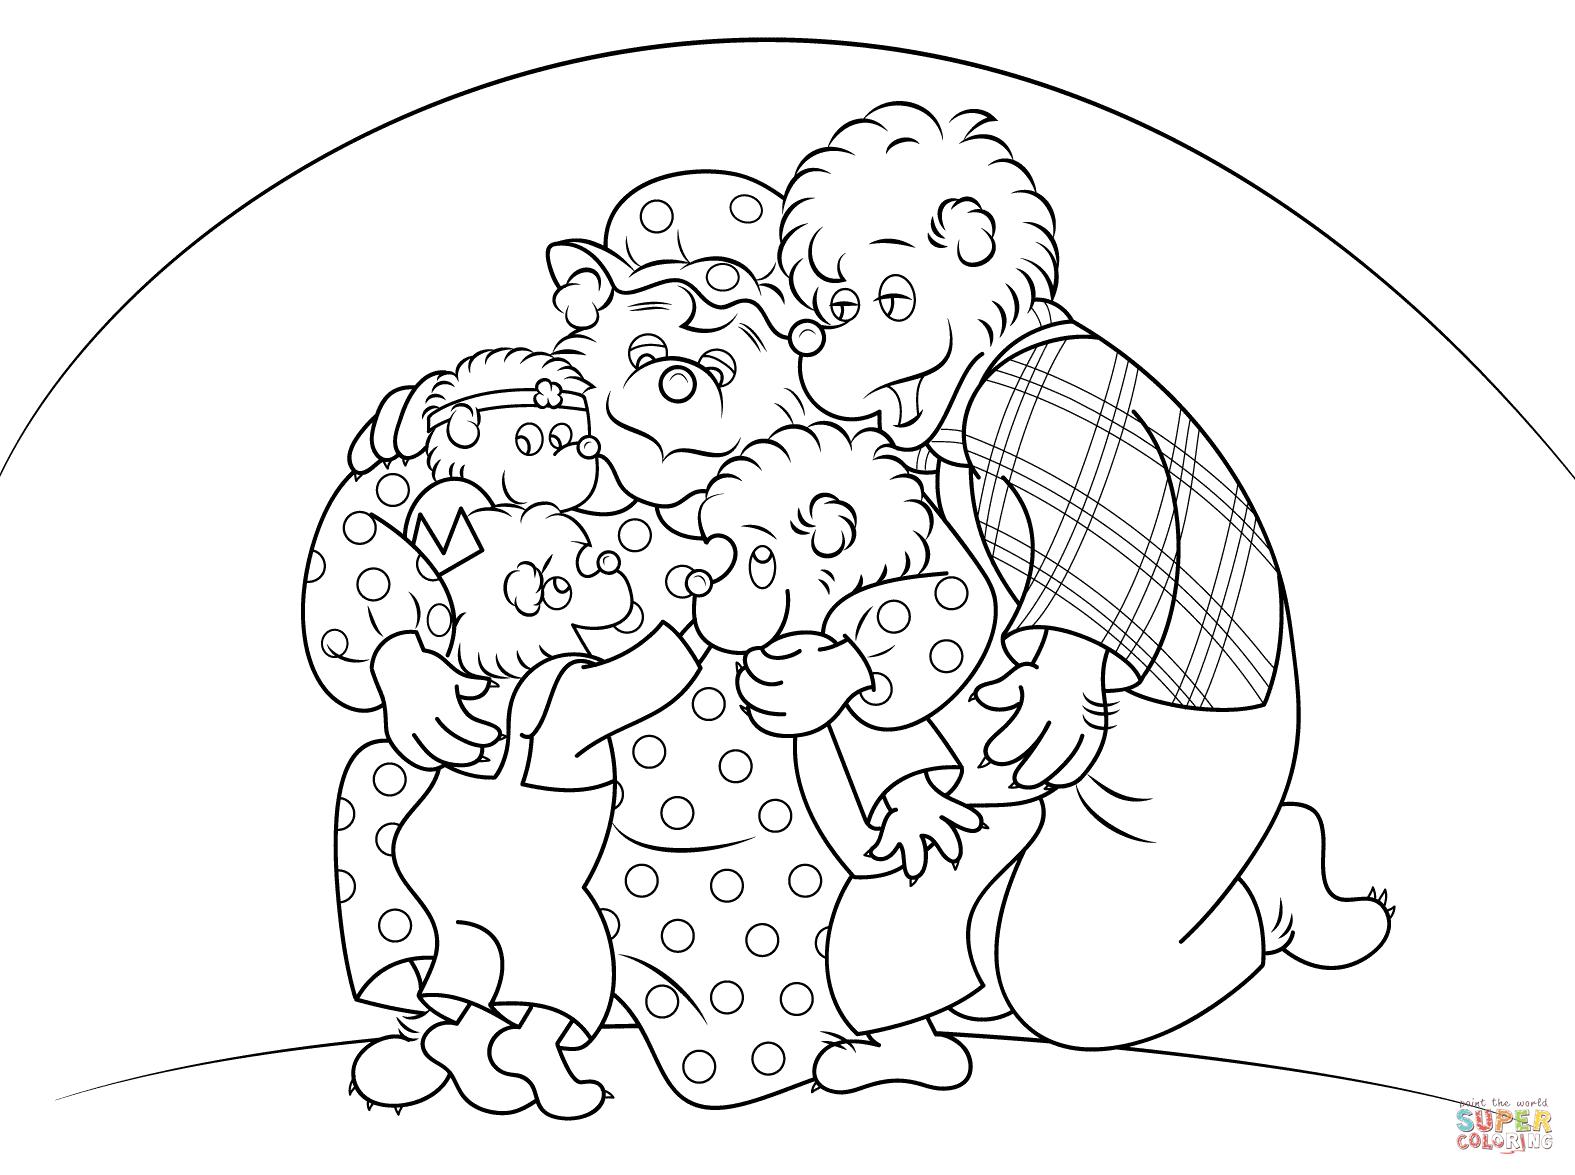 berenstain bears coloring page - Berenstain Bears Coloring Book